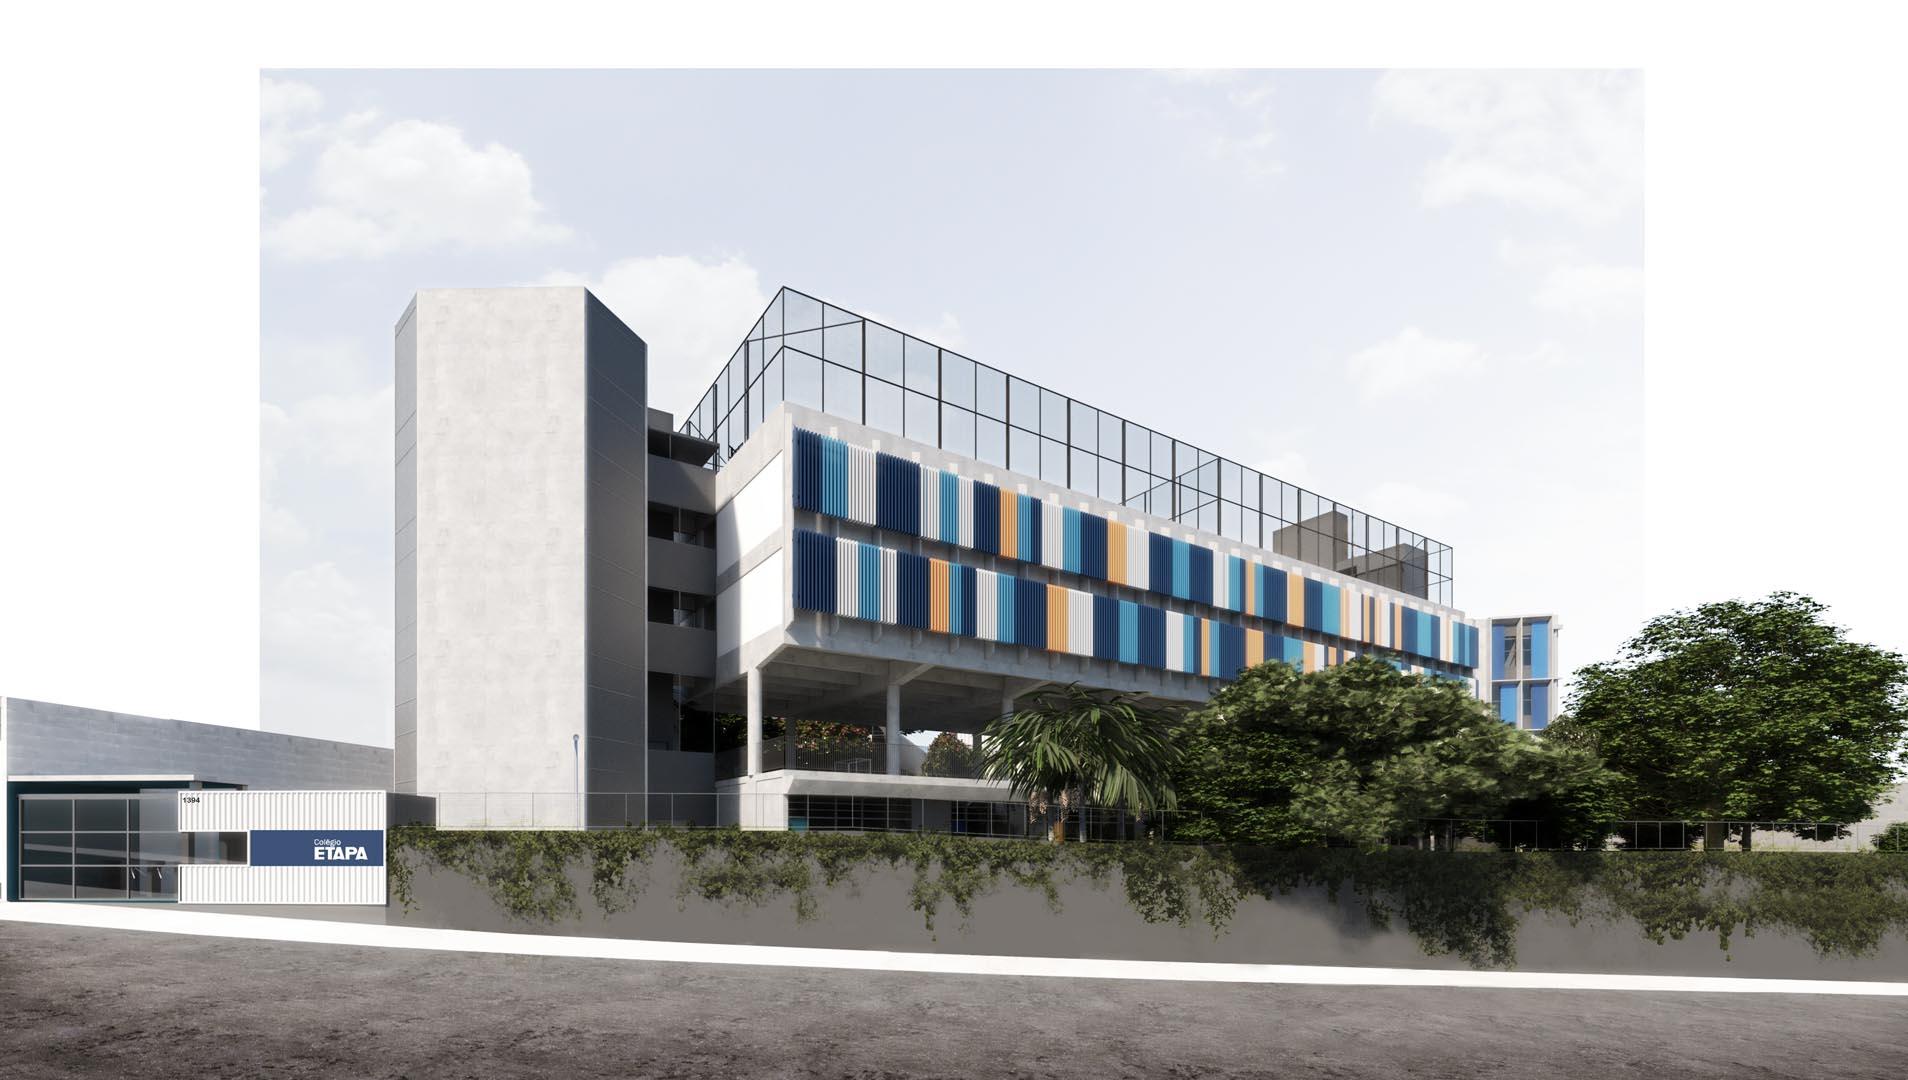 Fachada da Avenida Mascote - Nova unidade do Colégio Etapa